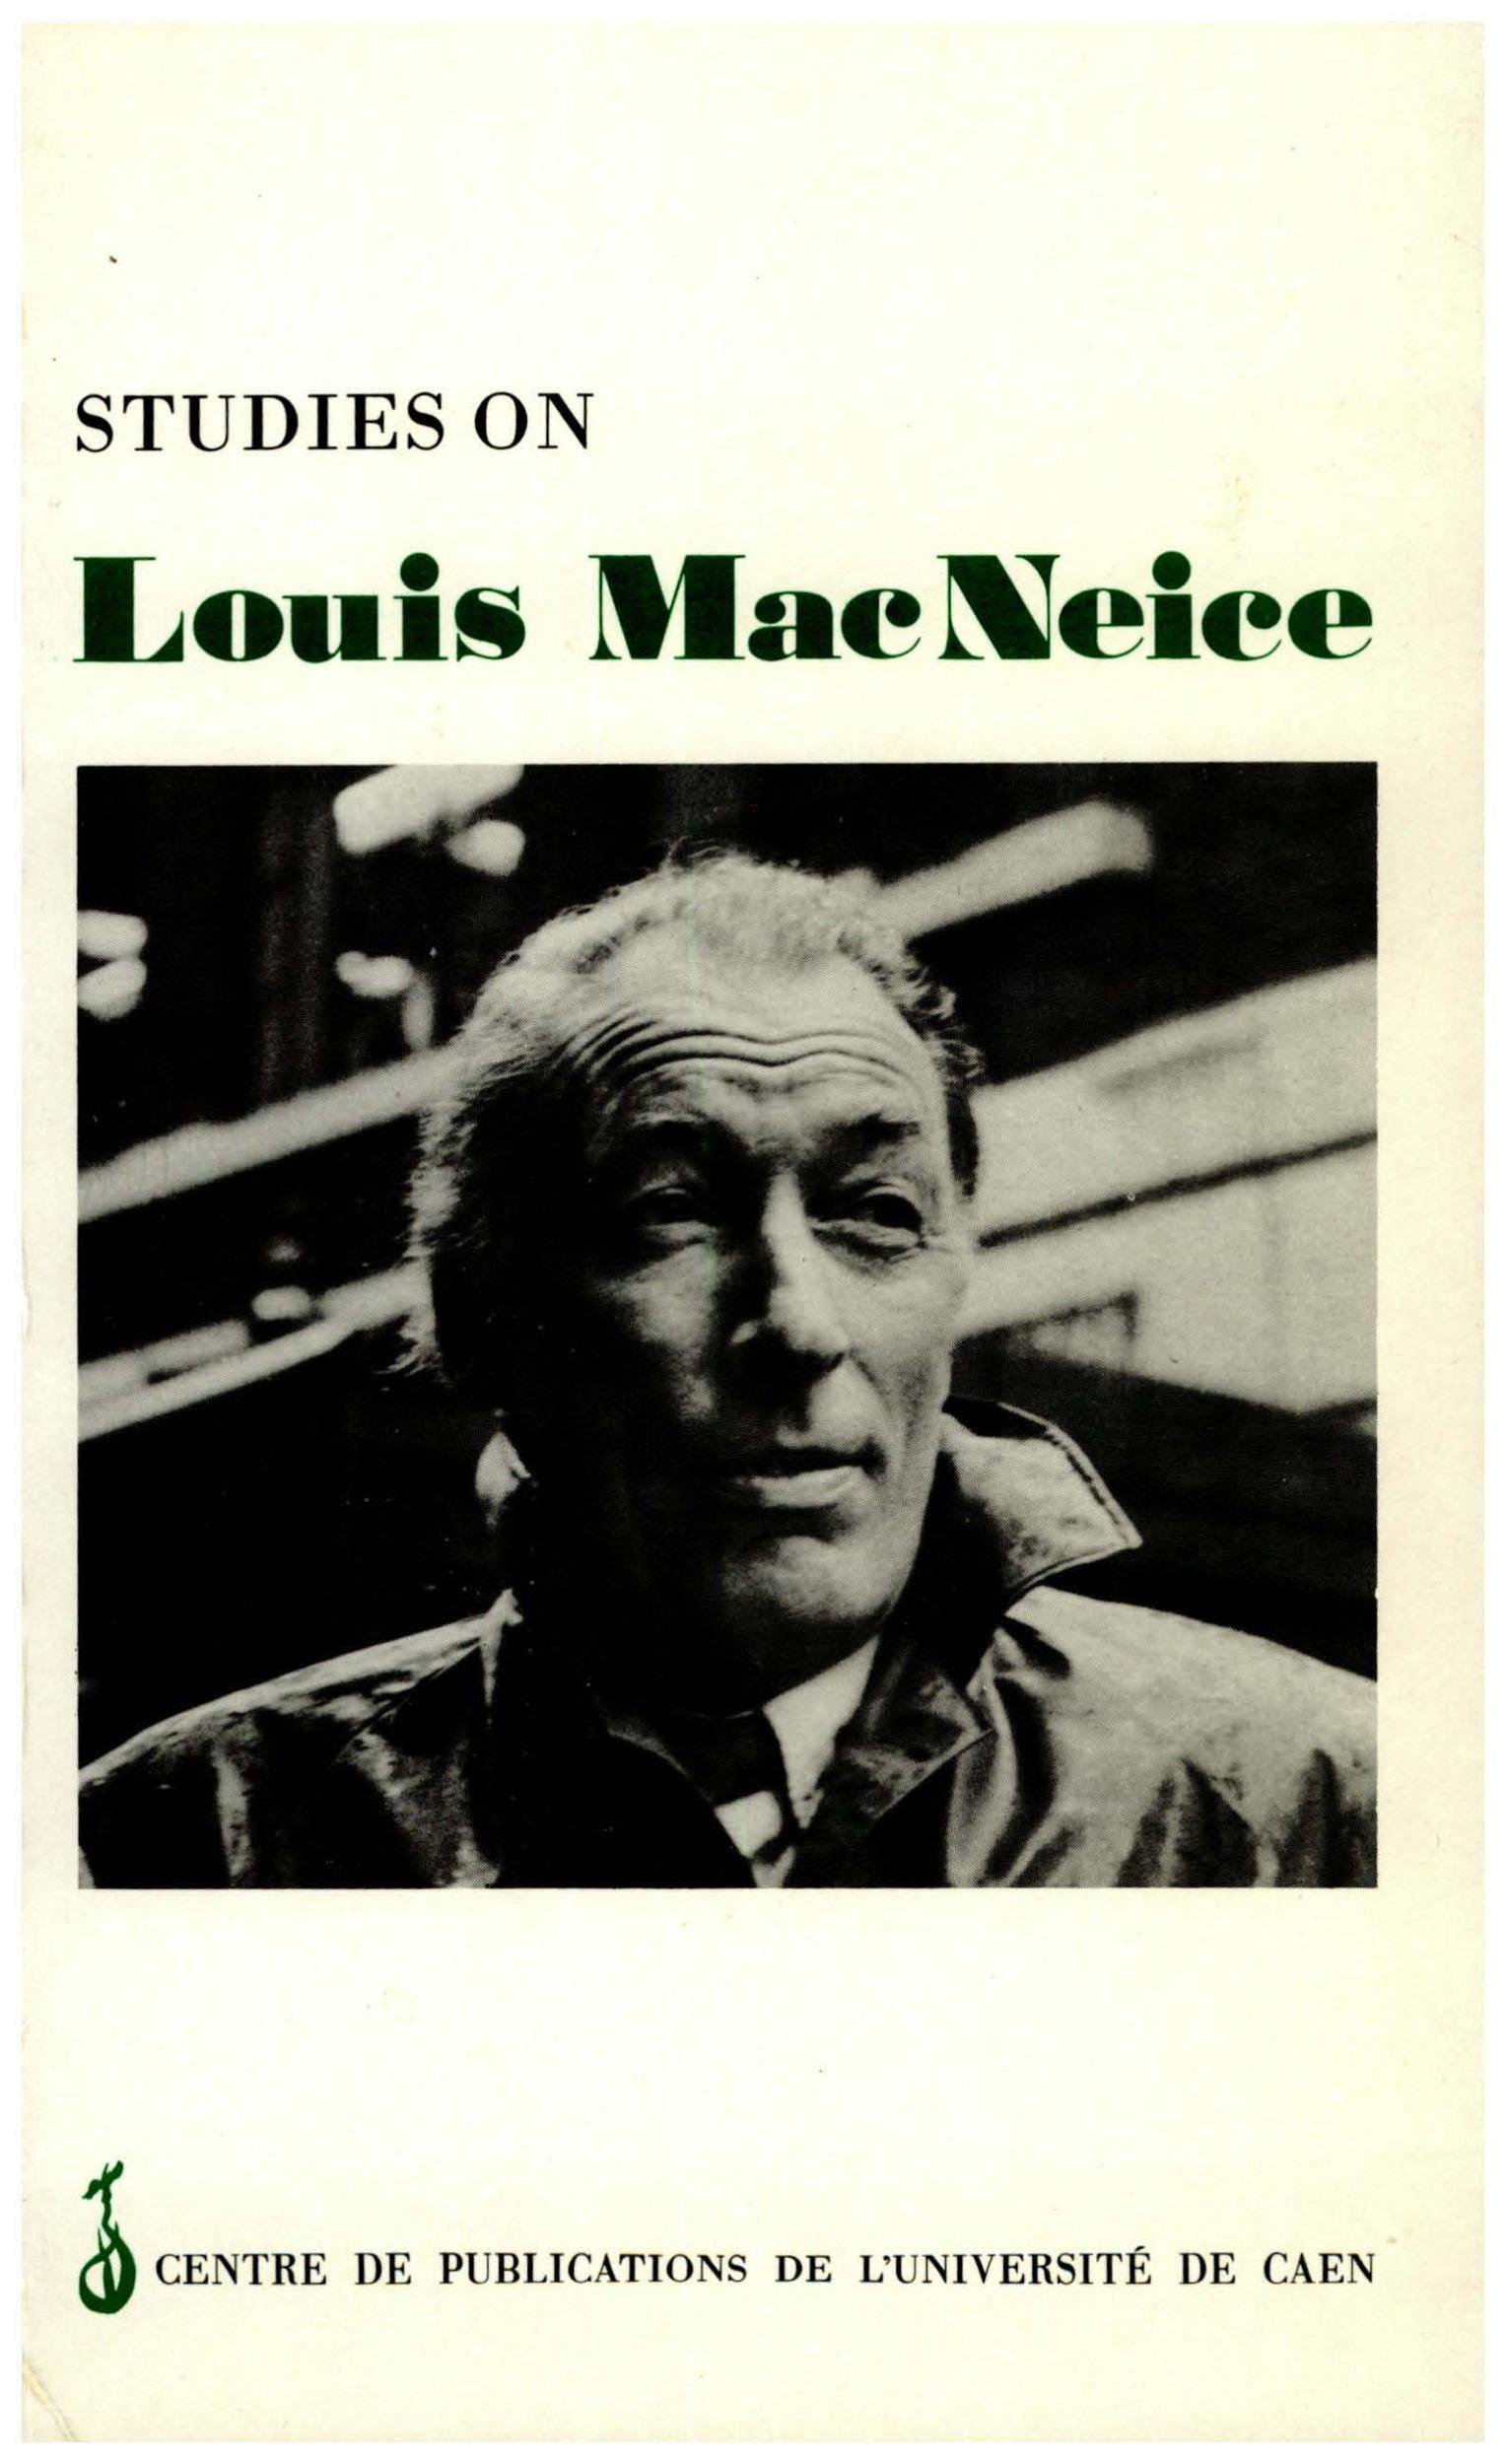 Studies on louis mac neice